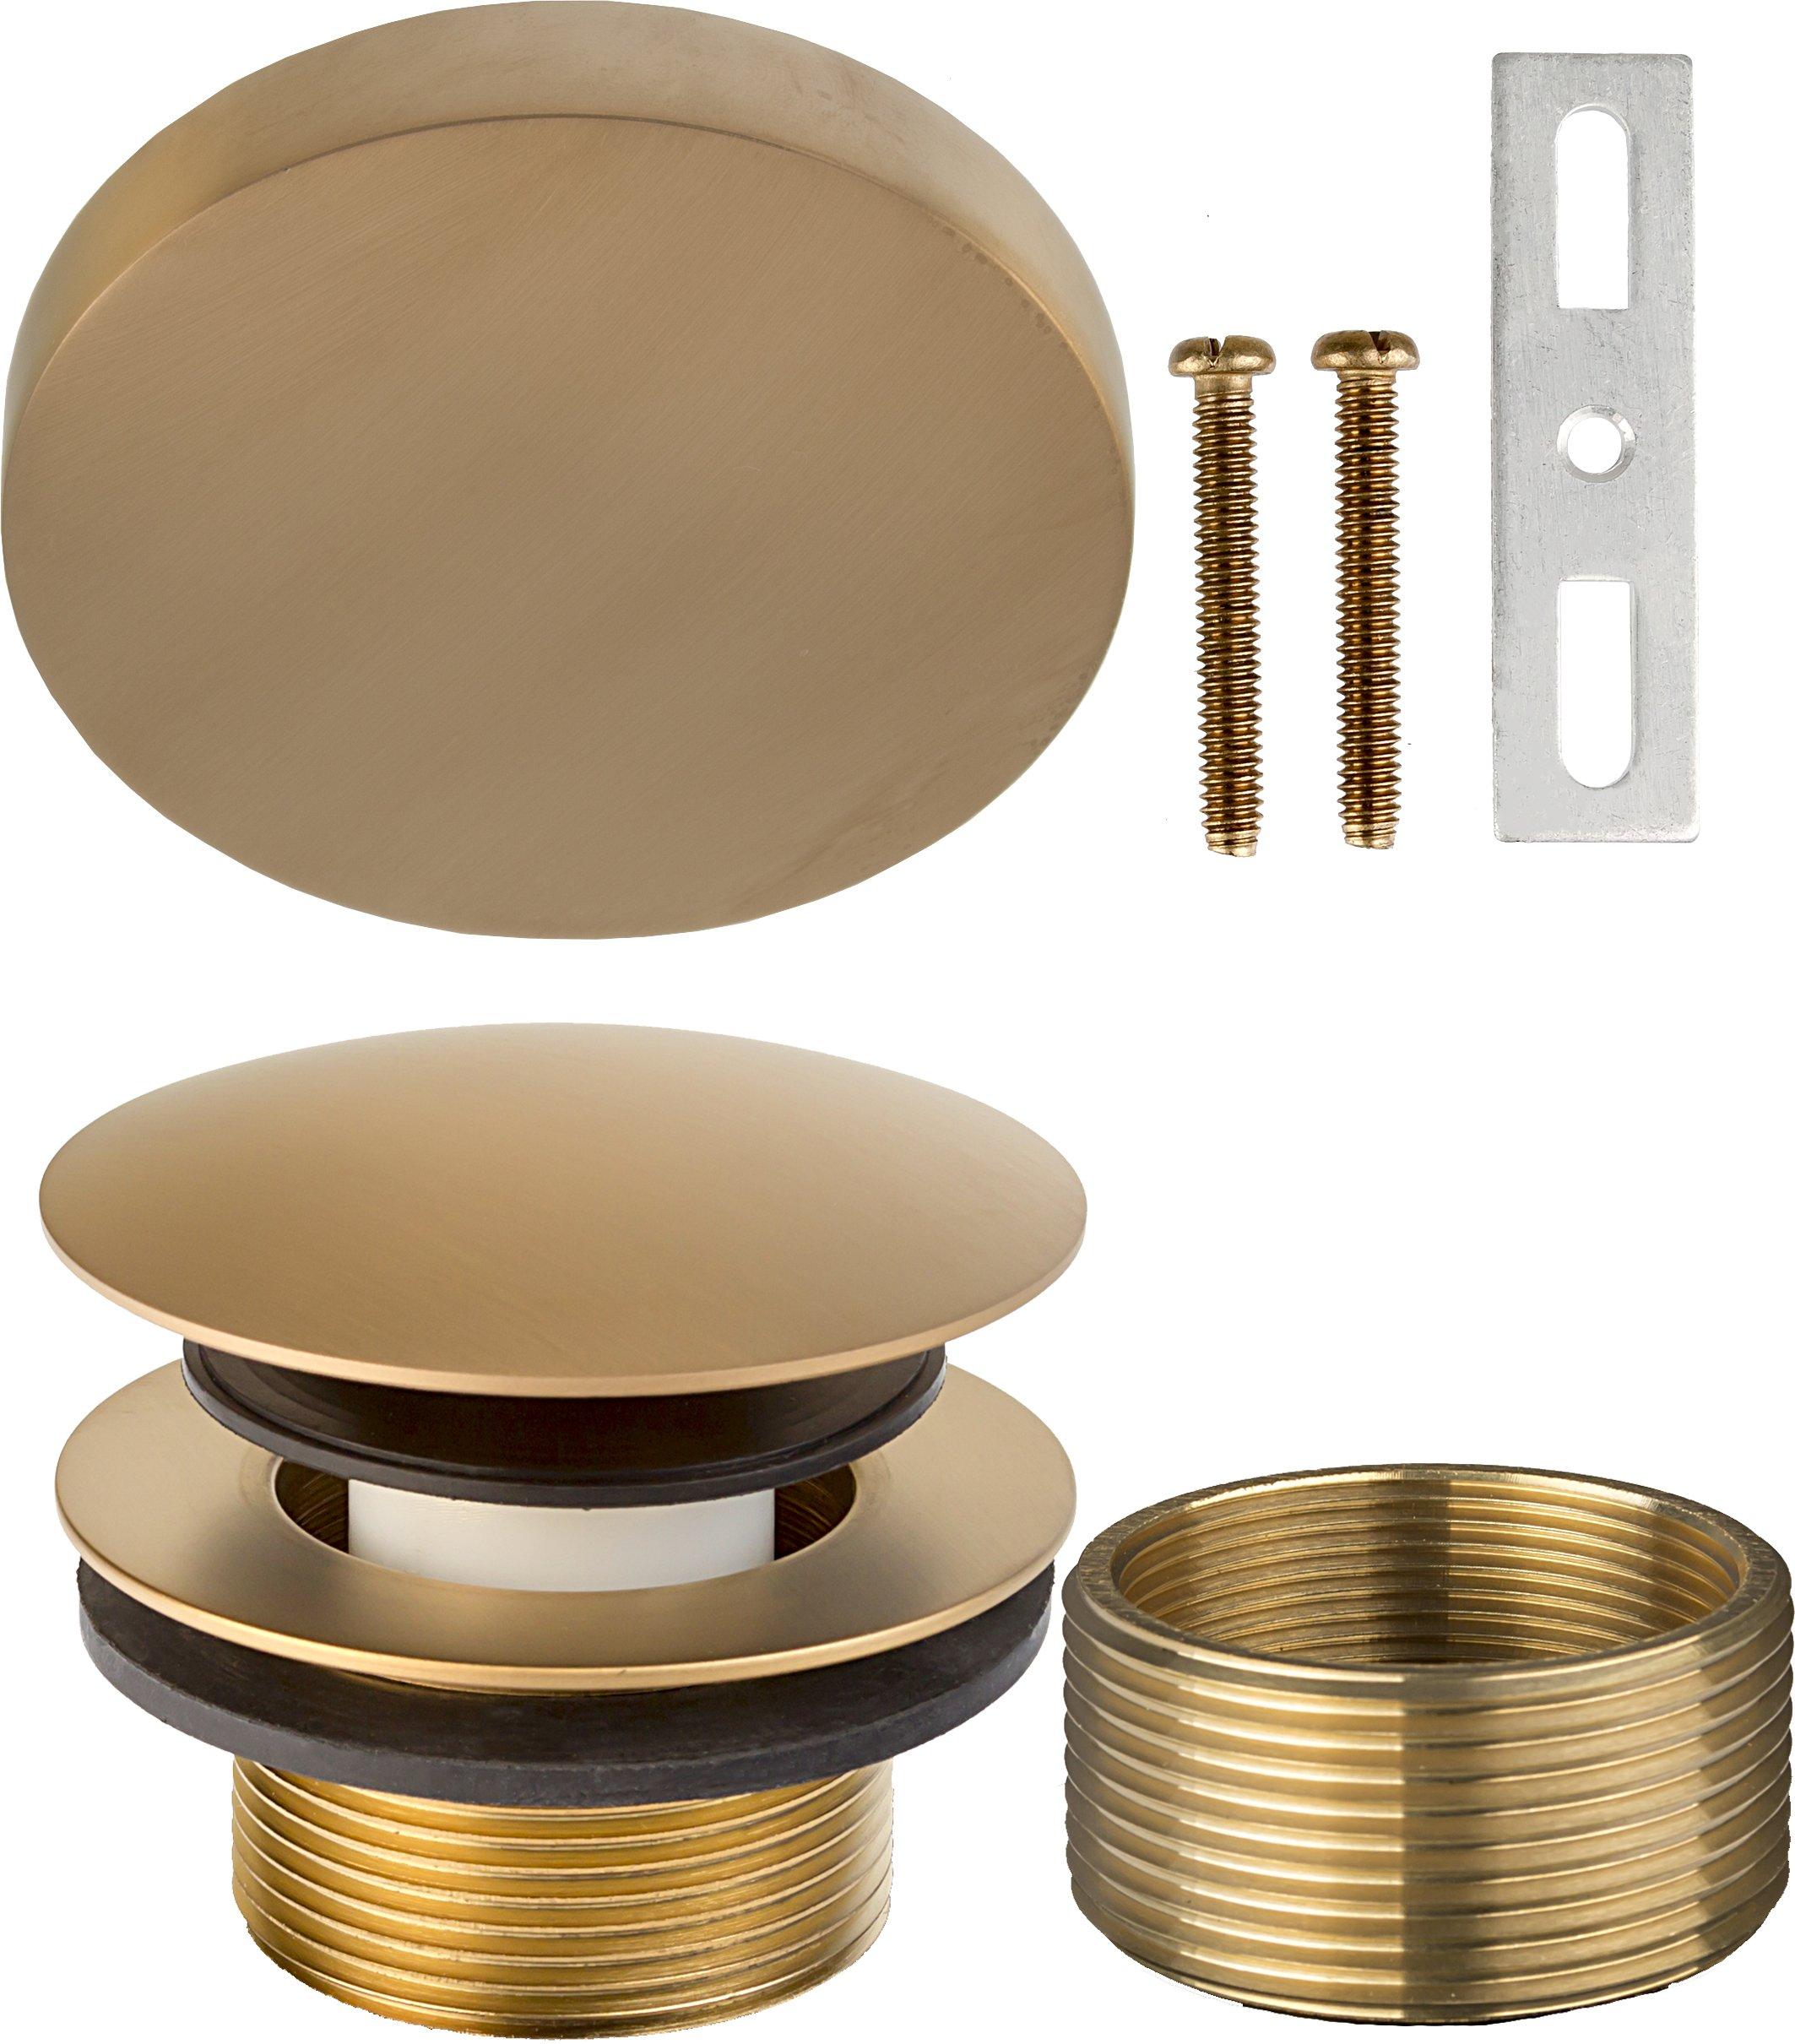 "1-1/2"" x 1-1/4"" (1-3/8 inch) Modern Mushroom Bath Waste Trim (Tub Drain and Faceplate)- PVD Satin Bronze"